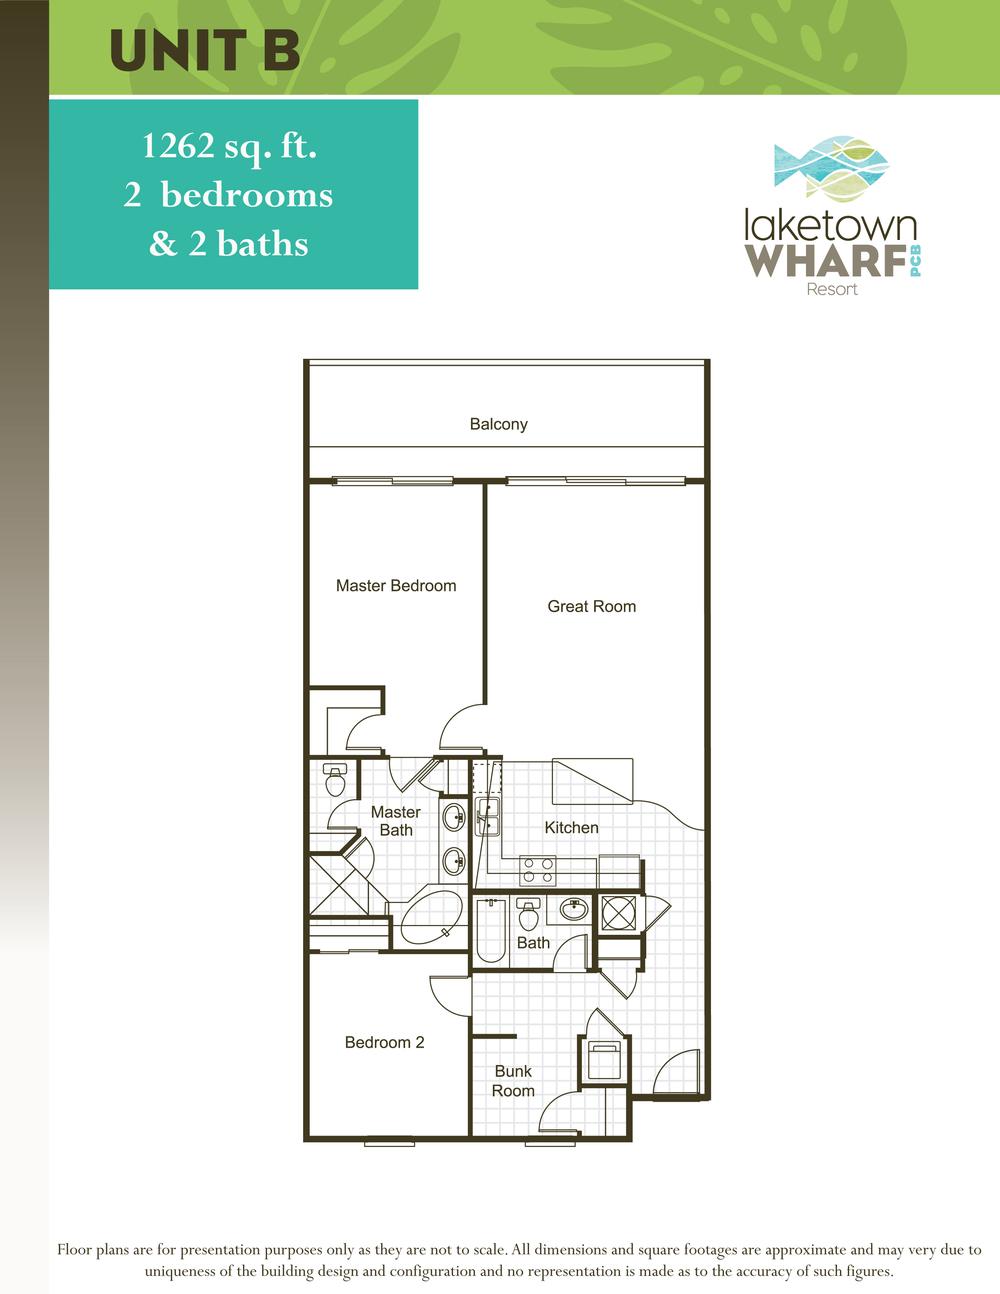 LTW+Unit+B+Edited+Floor+Plan-01.jpg